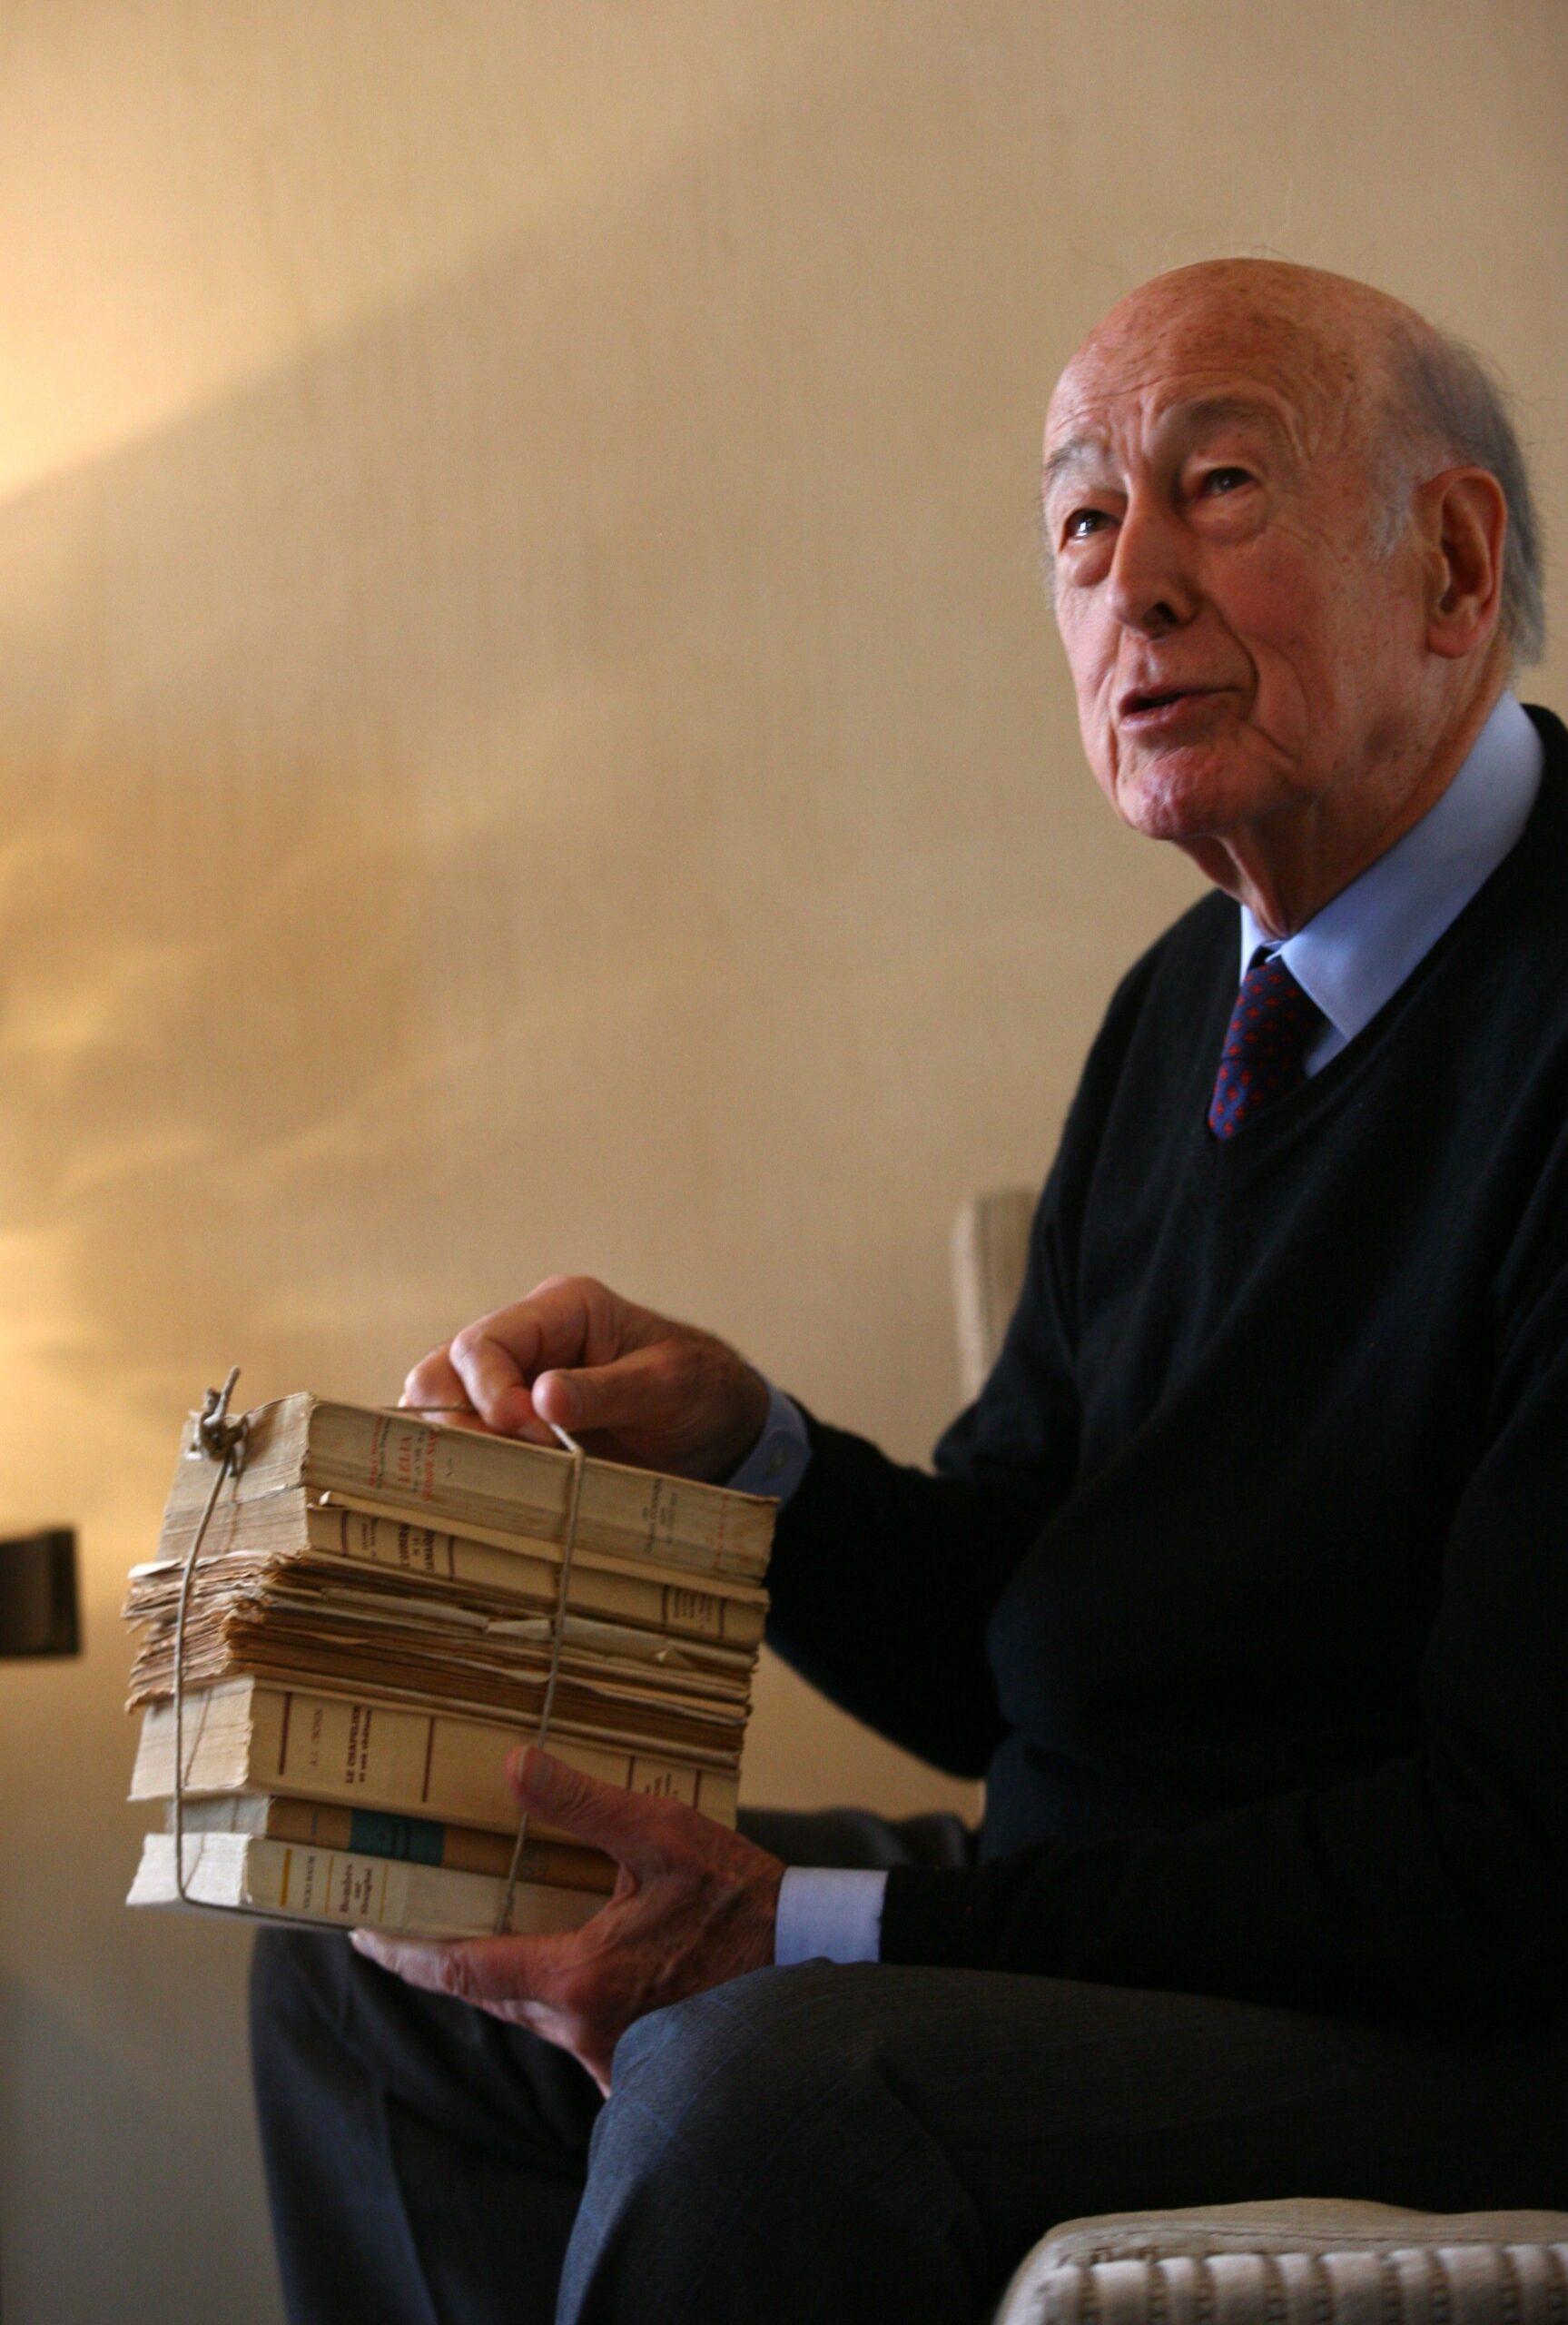 Valéry Giscard d'Estaing en una imatge del 2010 / Europa Press